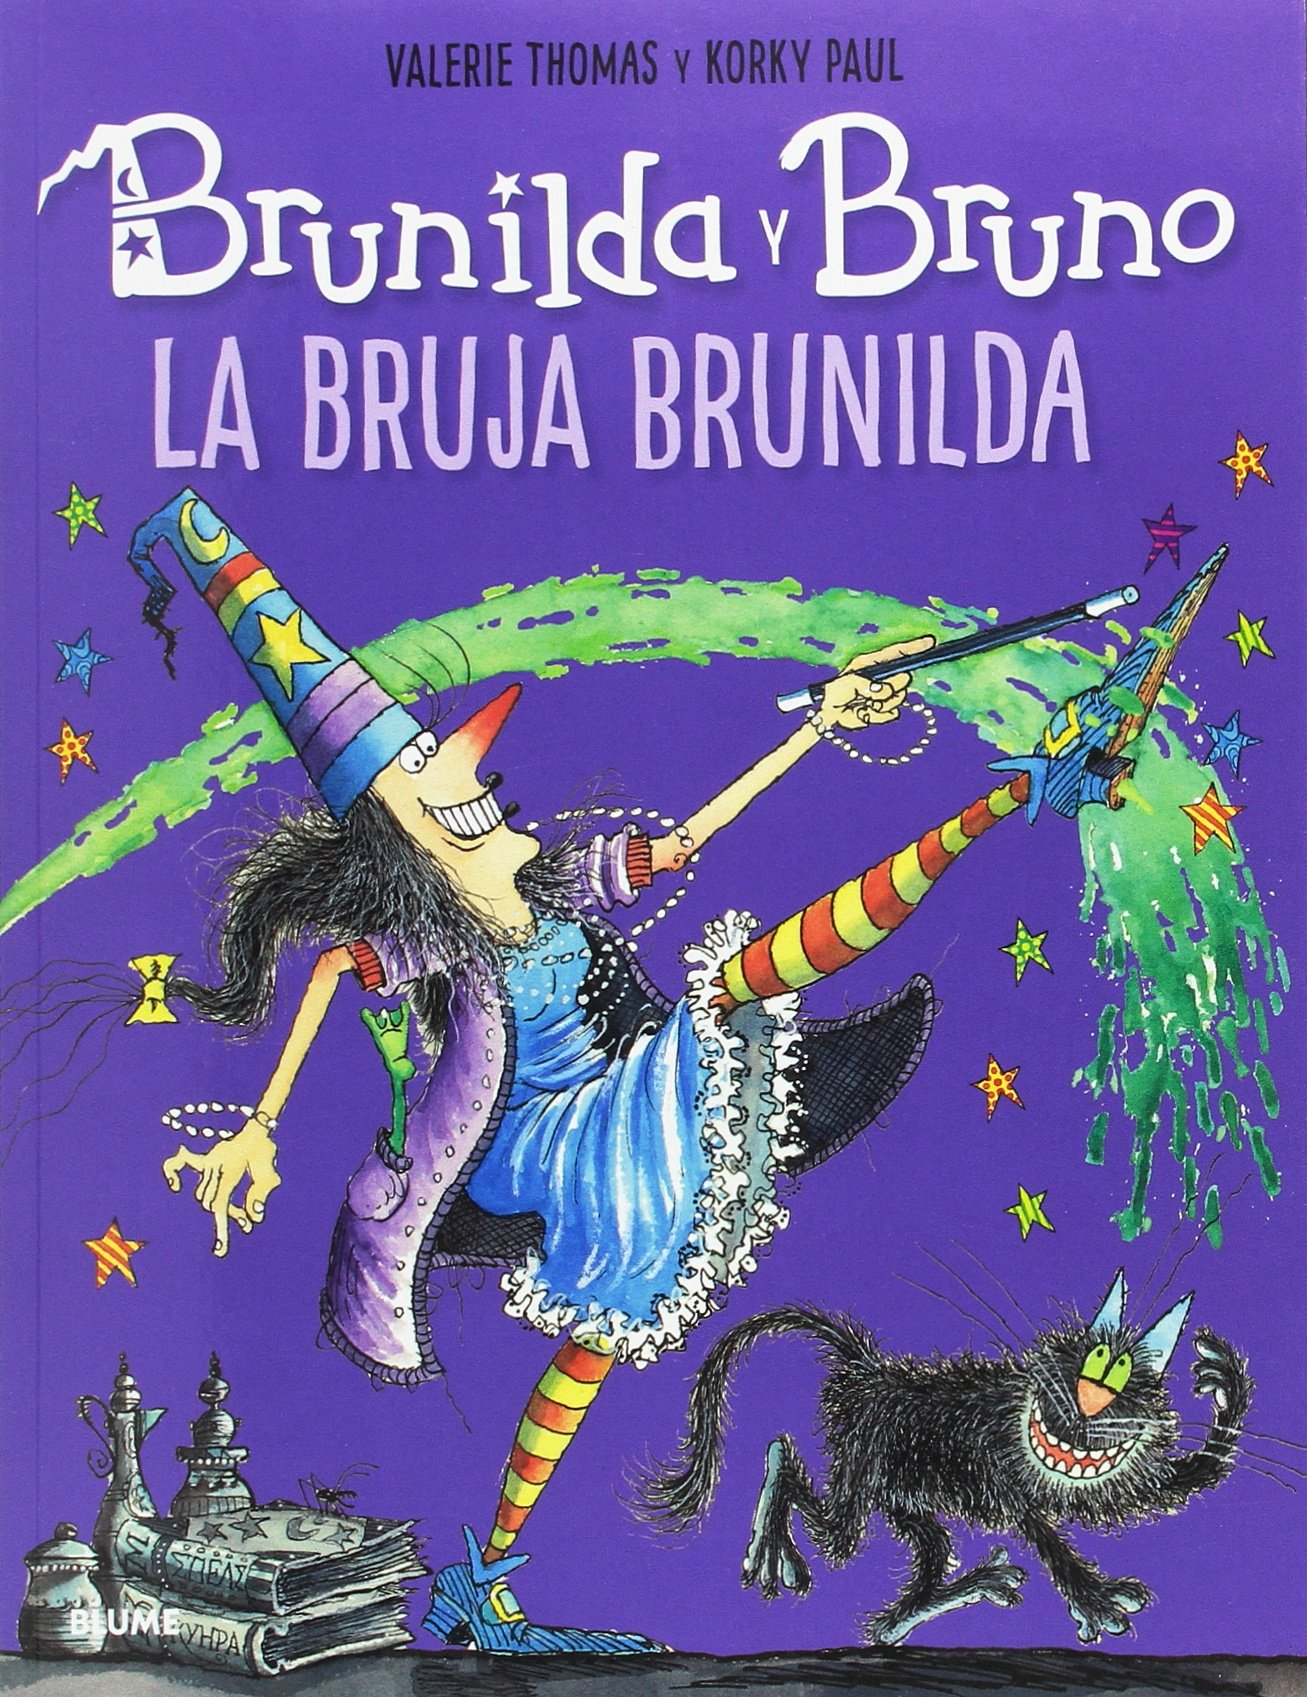 Brunilda y Bruno. La bruja Brunilda: Amazon.es: Thomas, Valerie, Paul, Korky, Rodríguez Fischer, Cristina, Diéguez Diéguez, Remedios: Libros